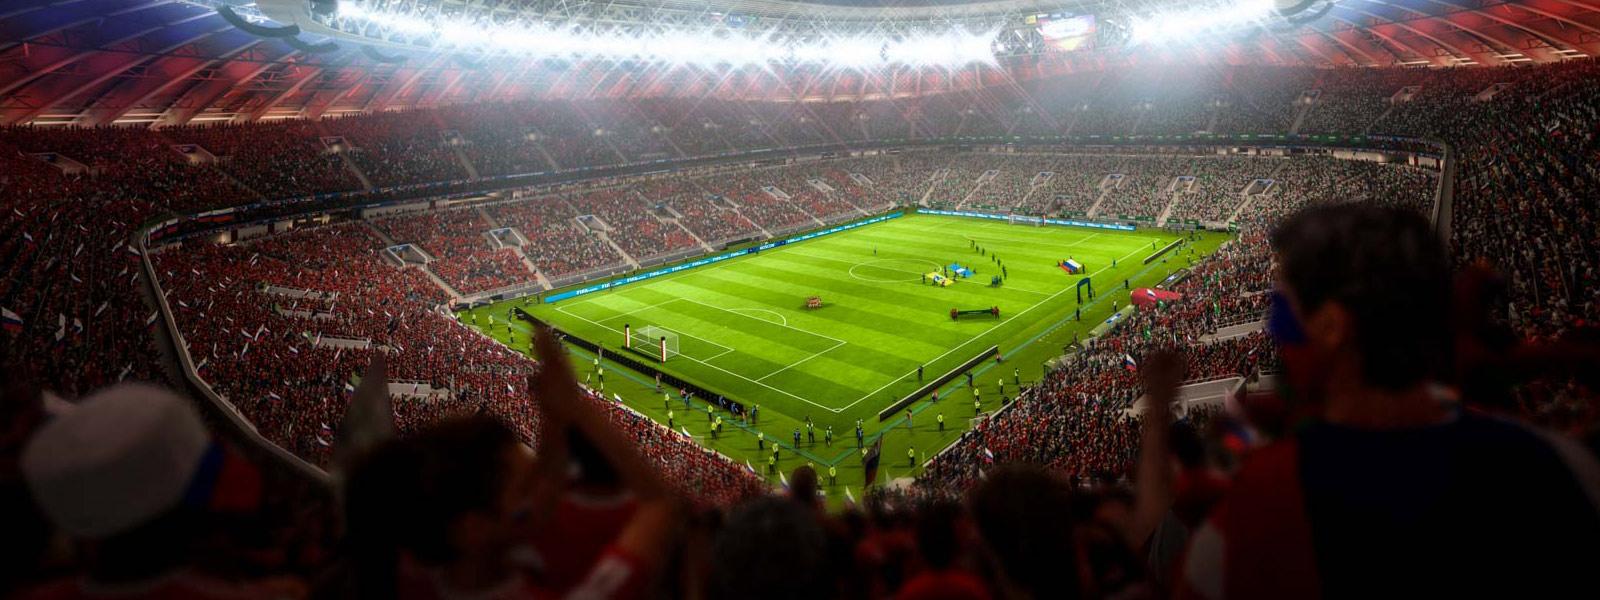 Vue de la foule au Stade Luzhniki